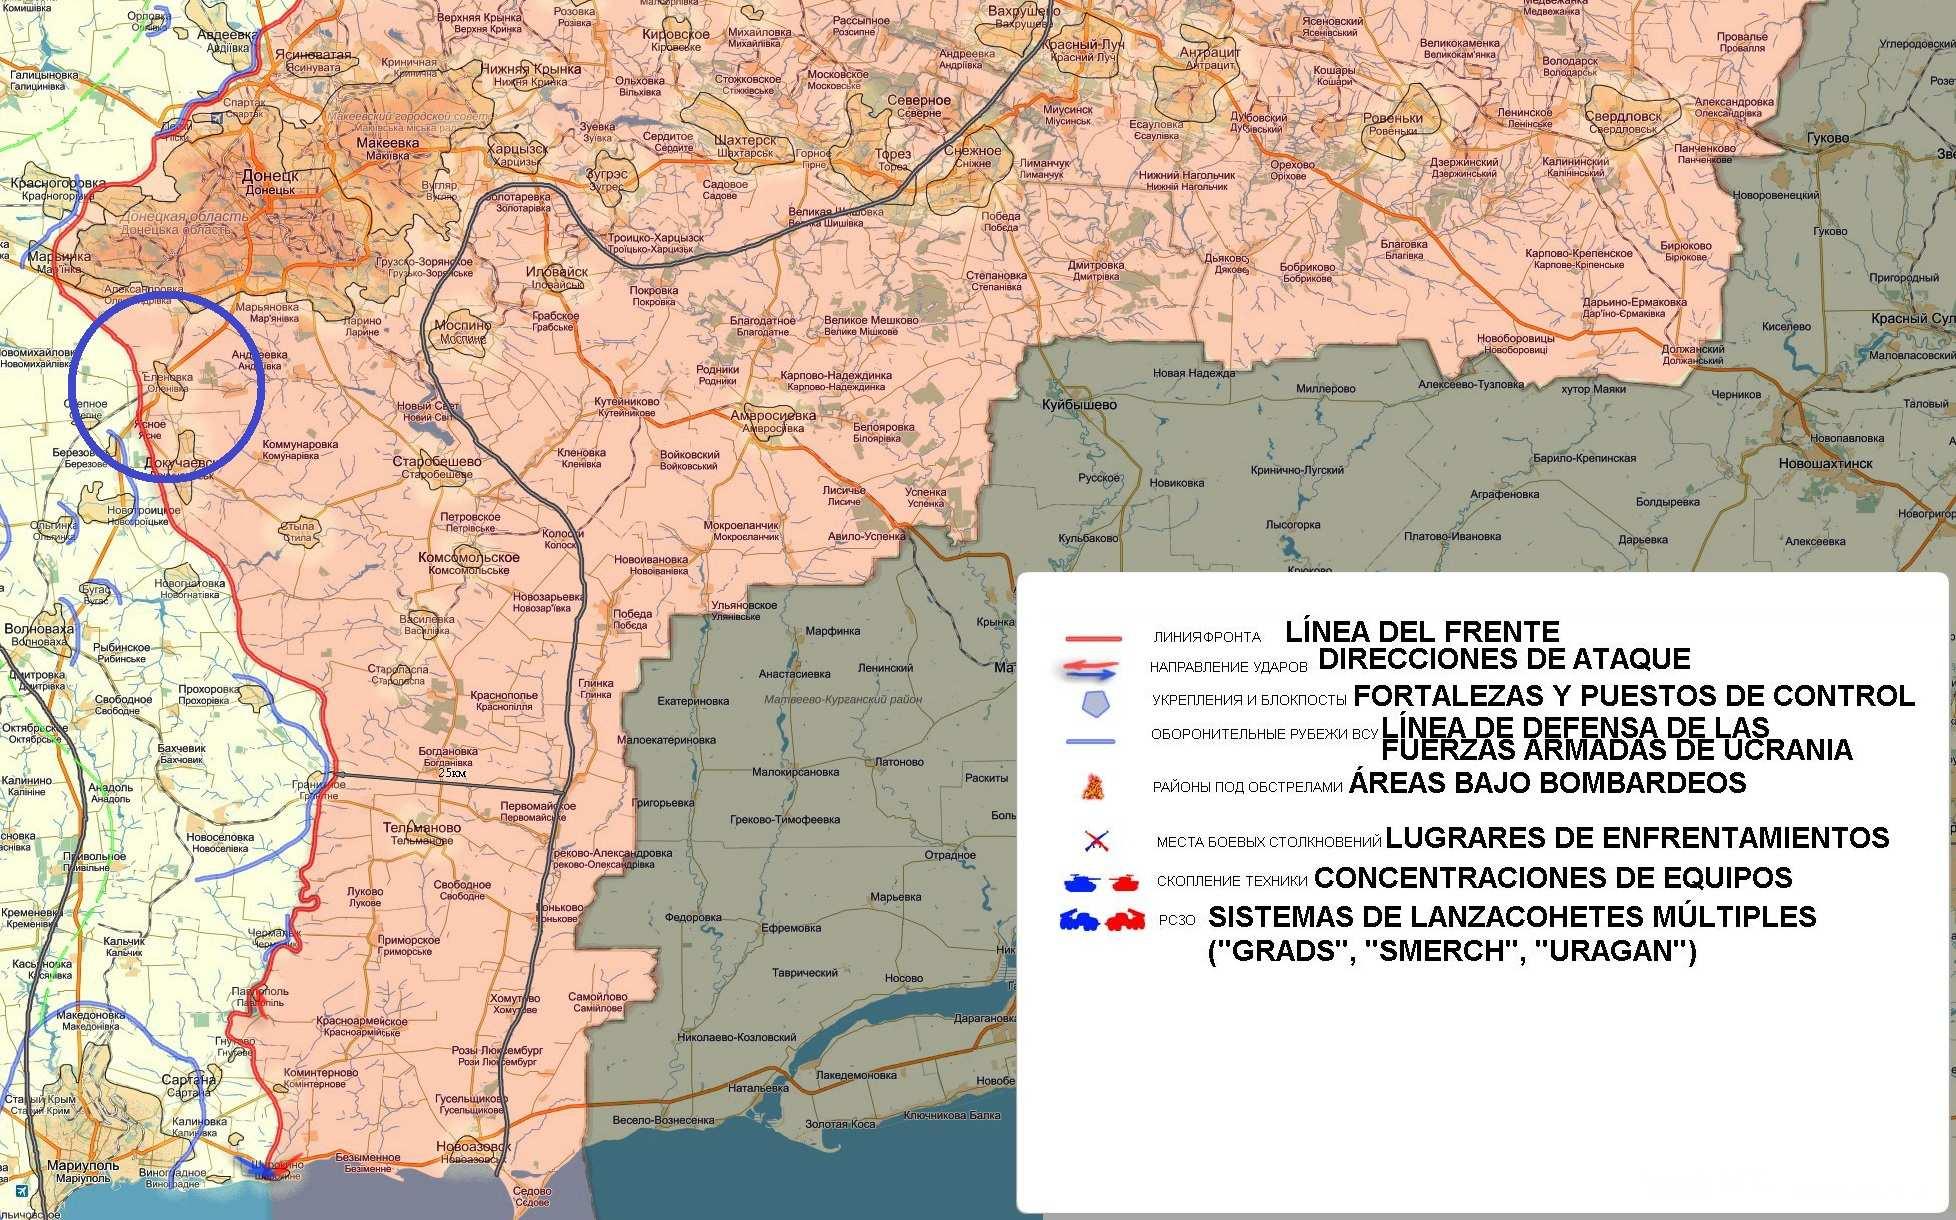 La República Popular de Donetsk culpa a las fuerzas de Ucrania de obstaculizar la entrega de ayuda humanitaria al Donbass